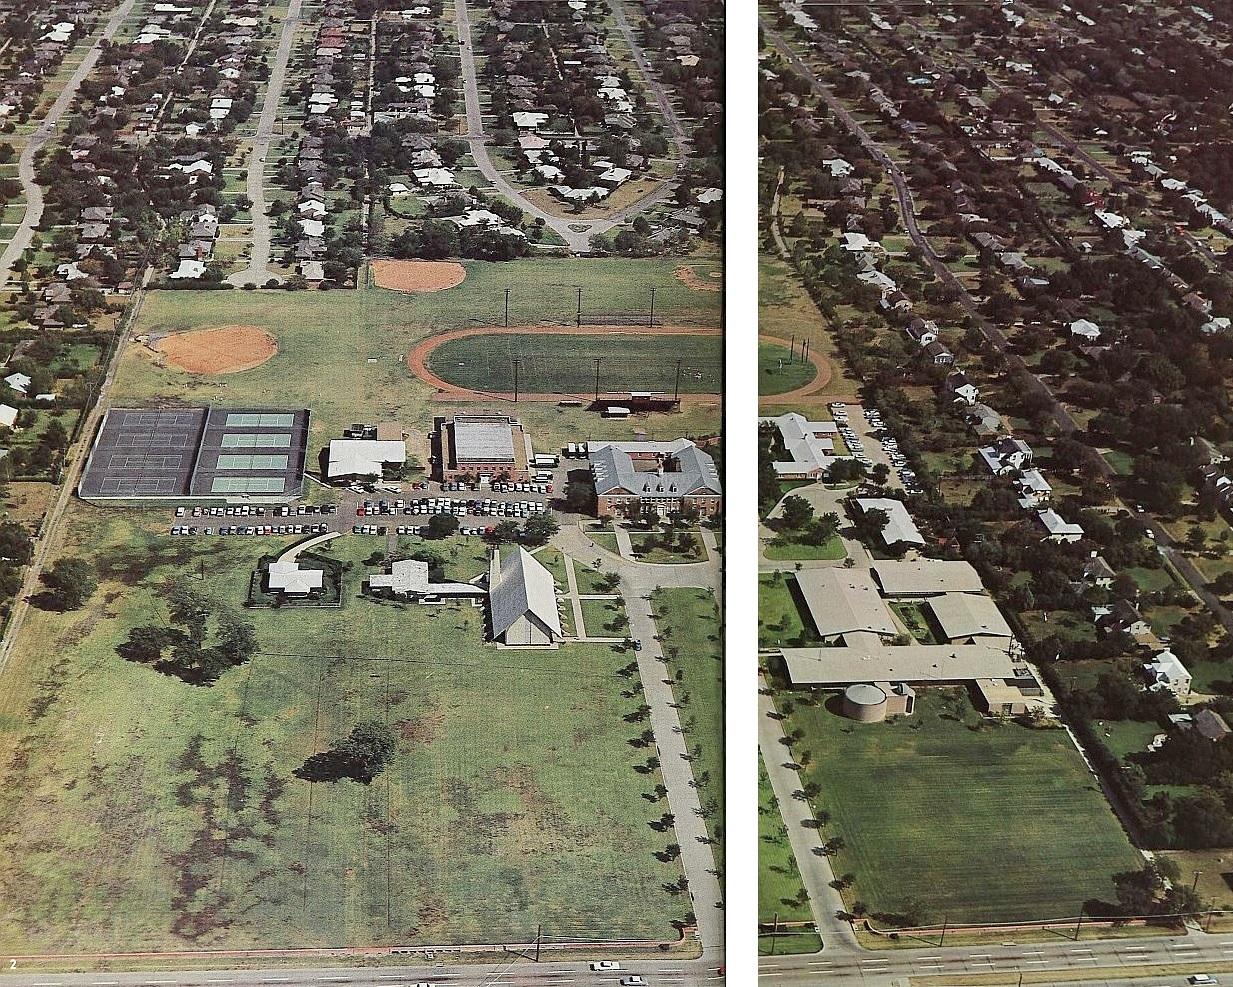 st-marks_campus_st-marks-yrbk_aerial-1964